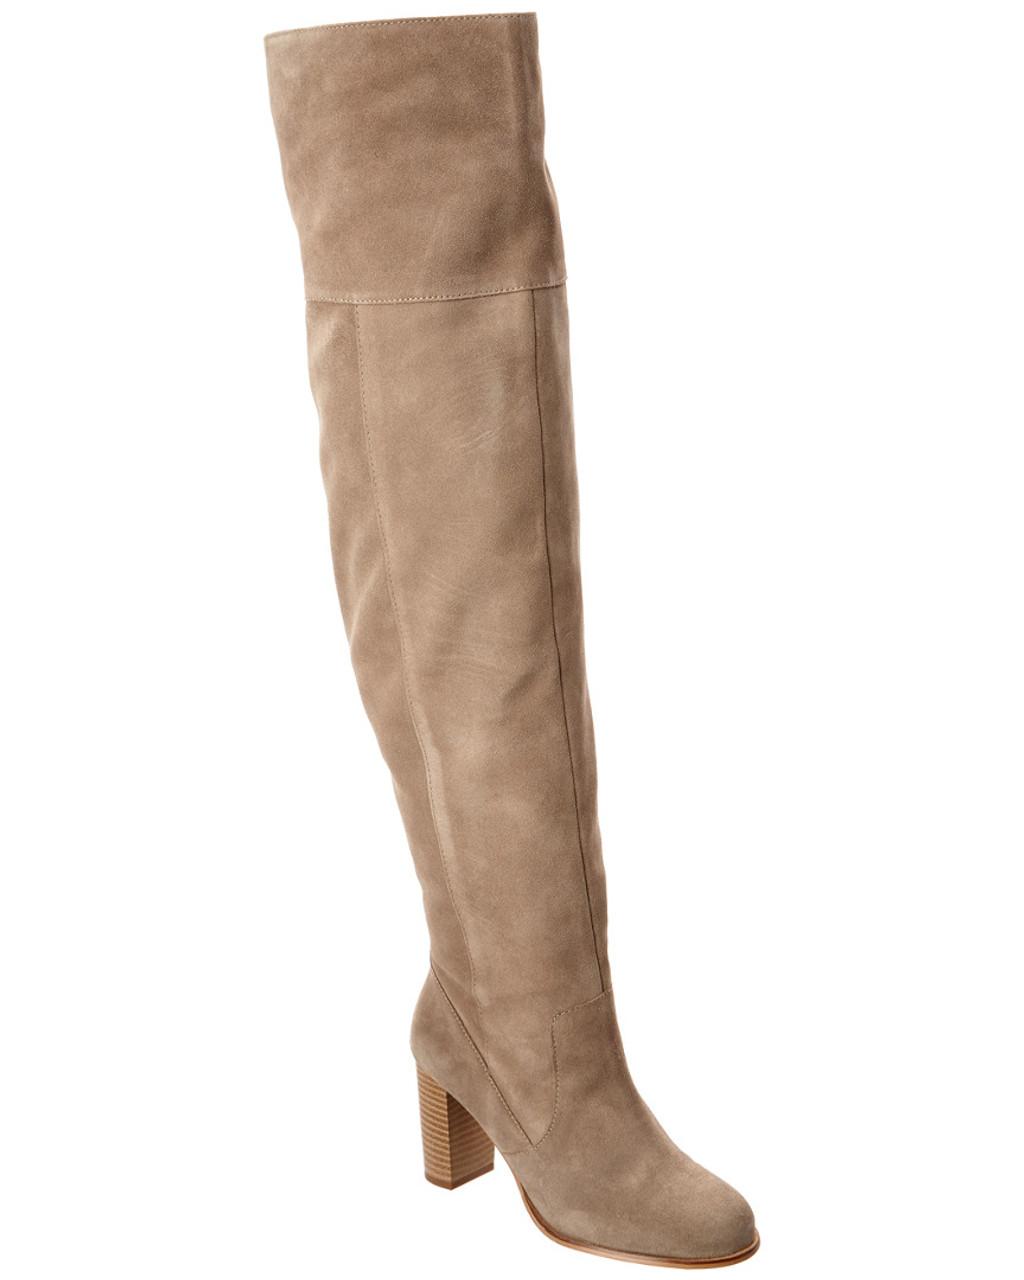 a01c64914e Seychelles Trixie Suede Over-The-Knee Boot~1311498087 - Bon-Ton